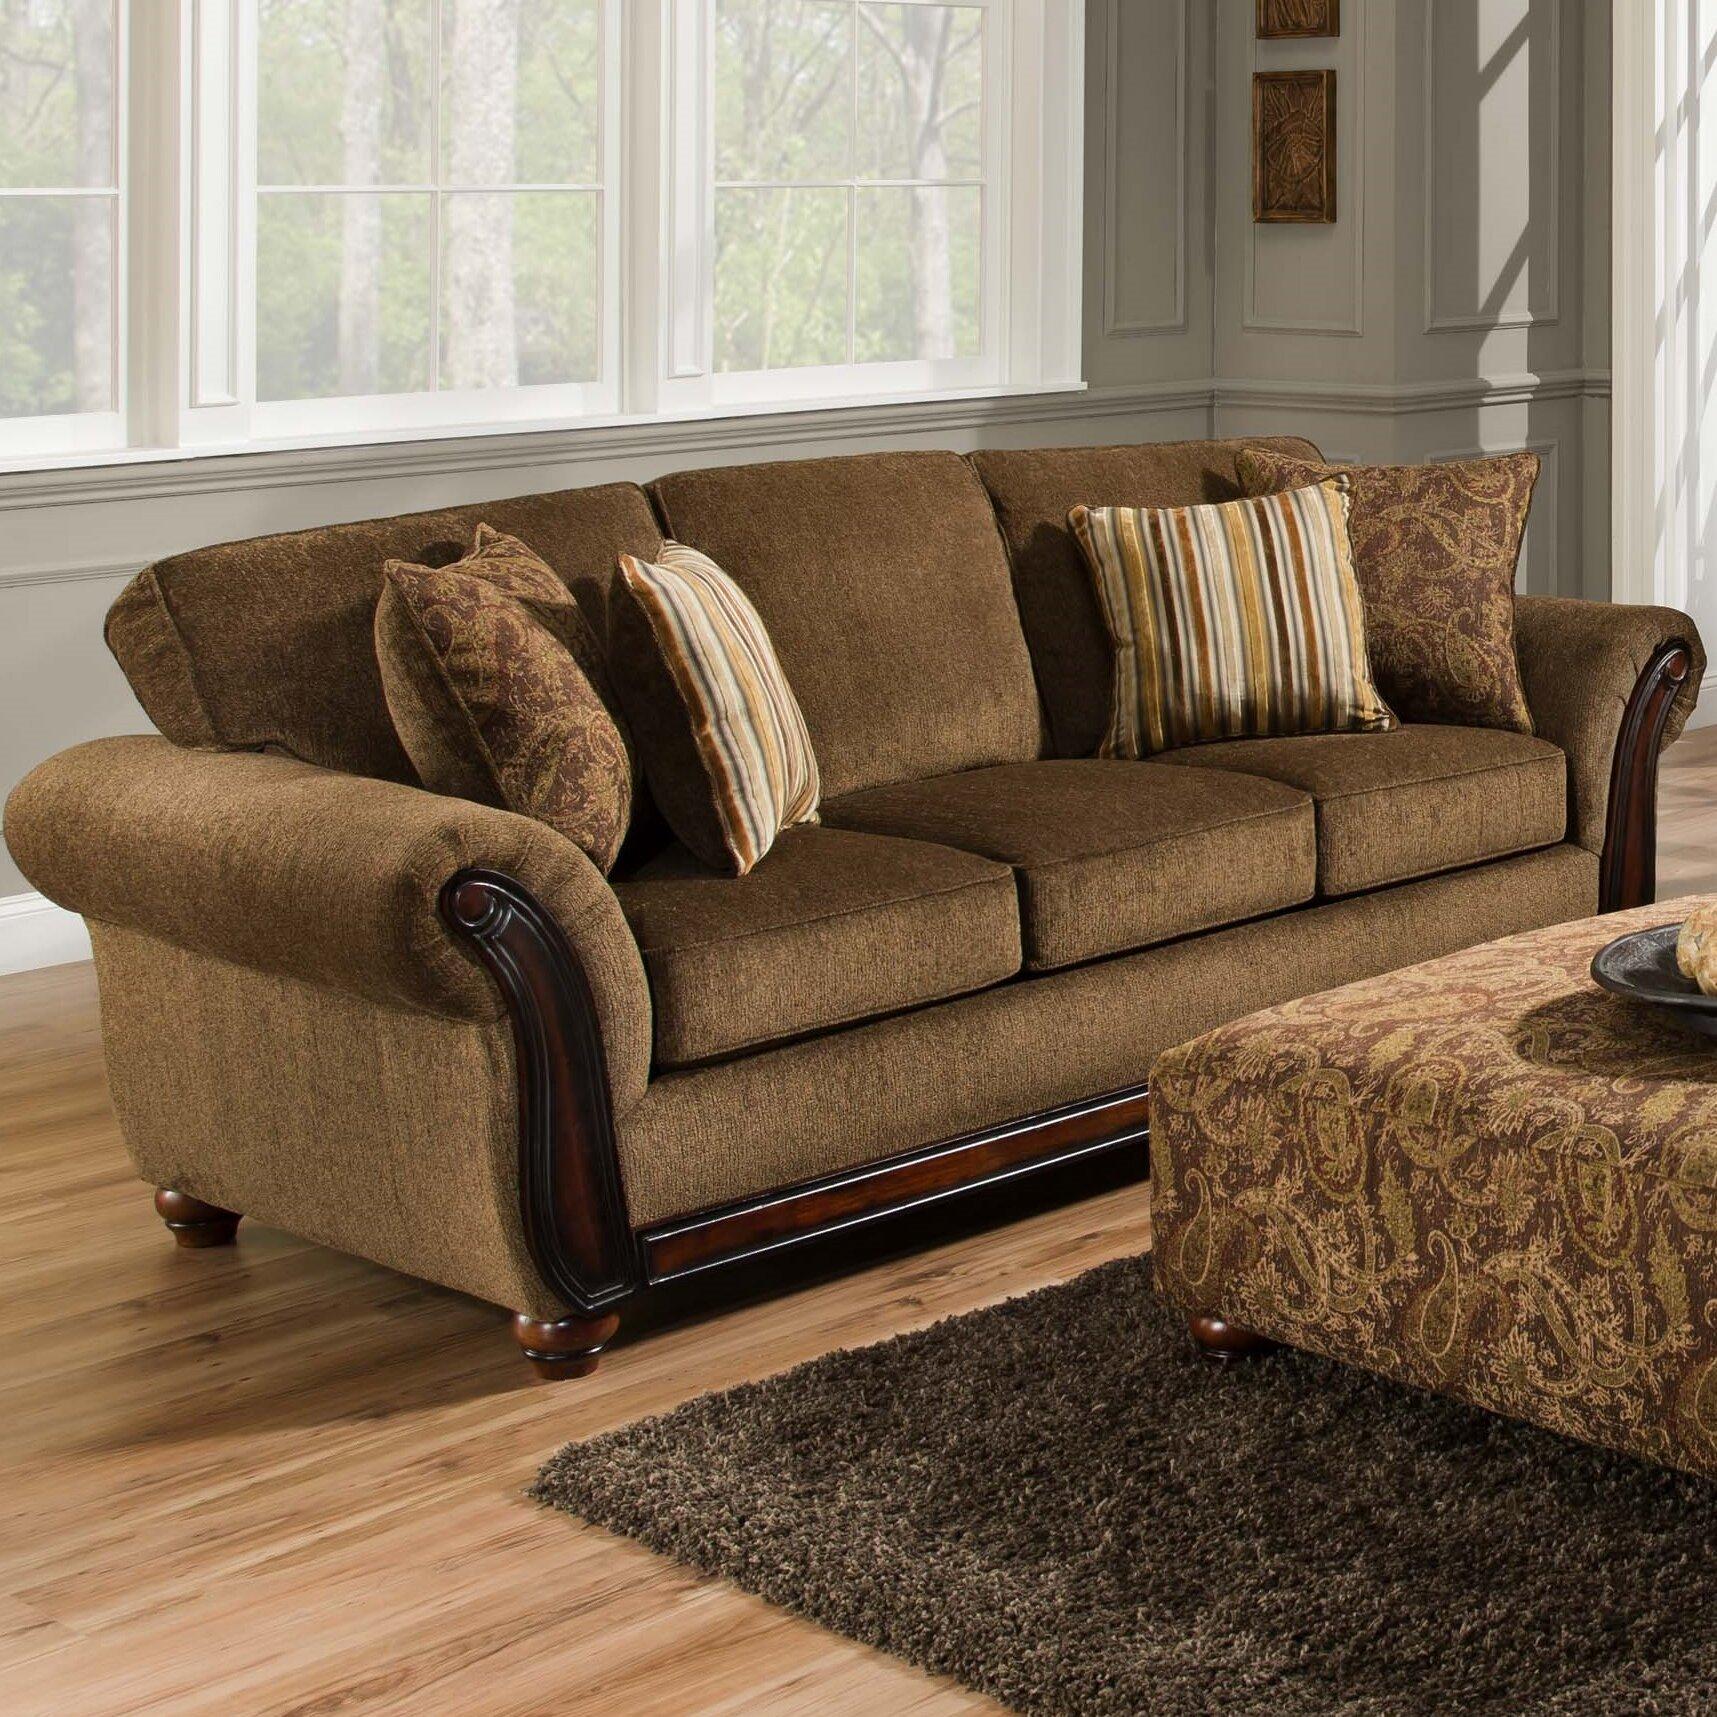 Dcor Design Fairfax 96 Rolled Arm Sofa Reviews Wayfair